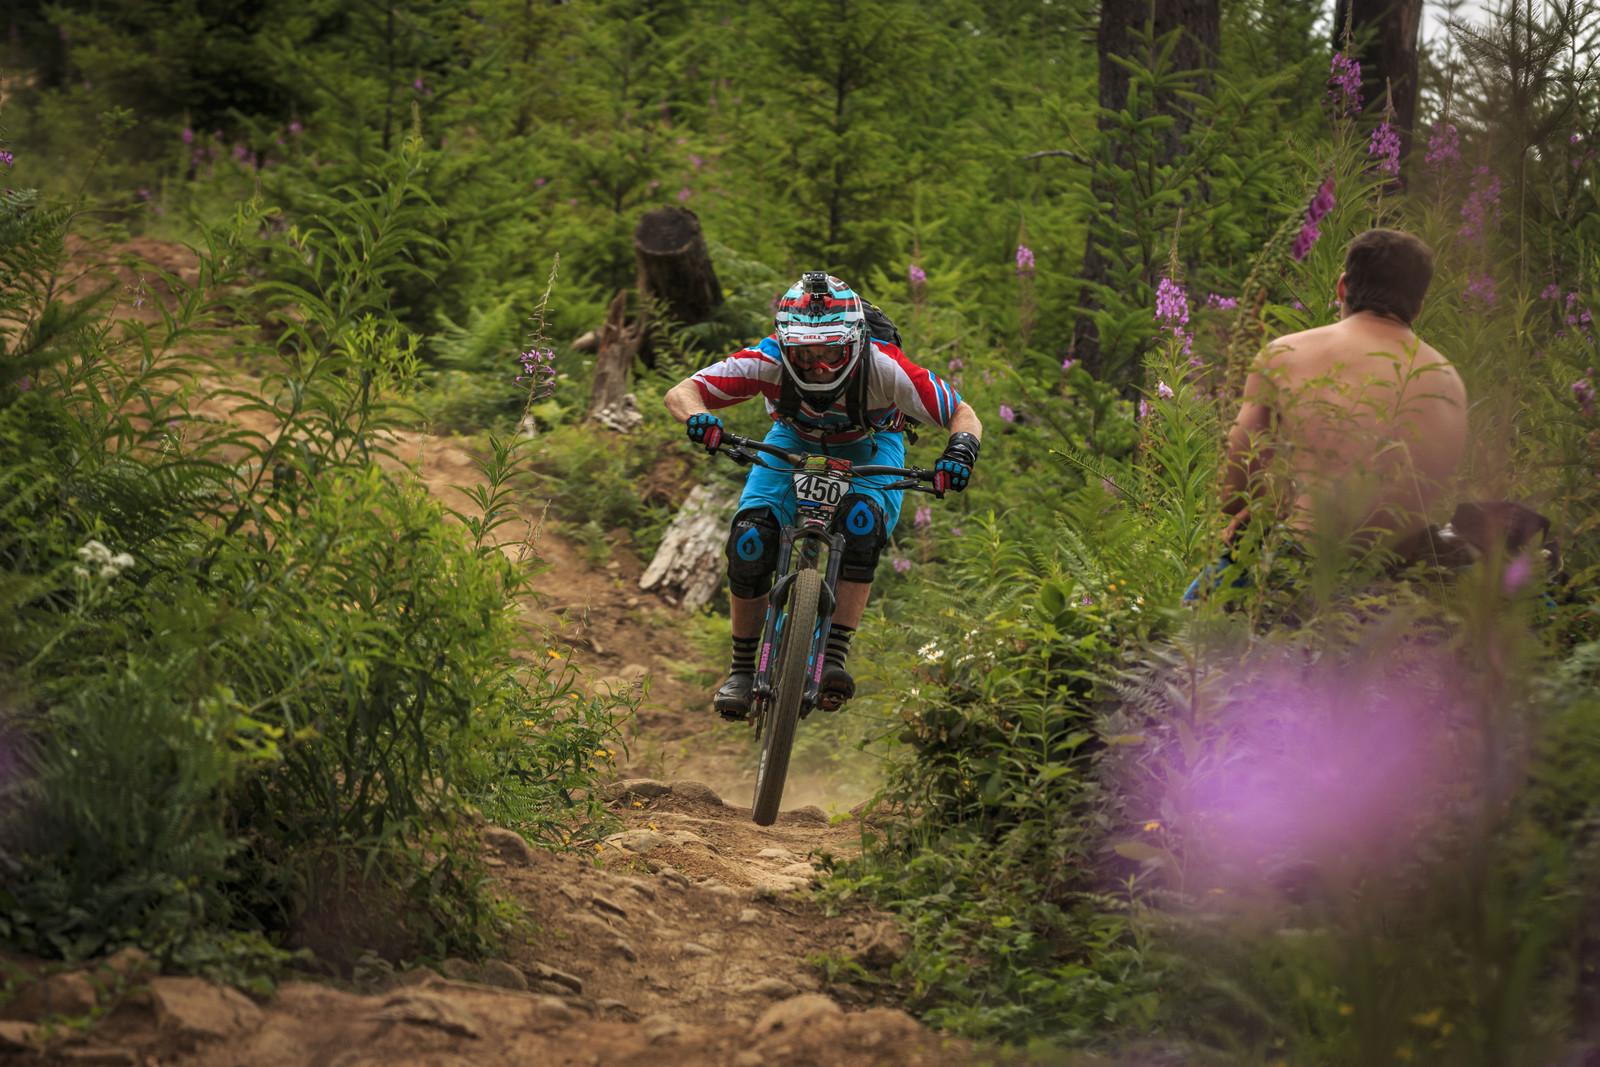 Nathan Riddle, 3rd Place Oregon Enduro, Cold Creek - 2014 Oregon Enduro, Cold Creek - Mountain Biking Pictures - Vital MTB